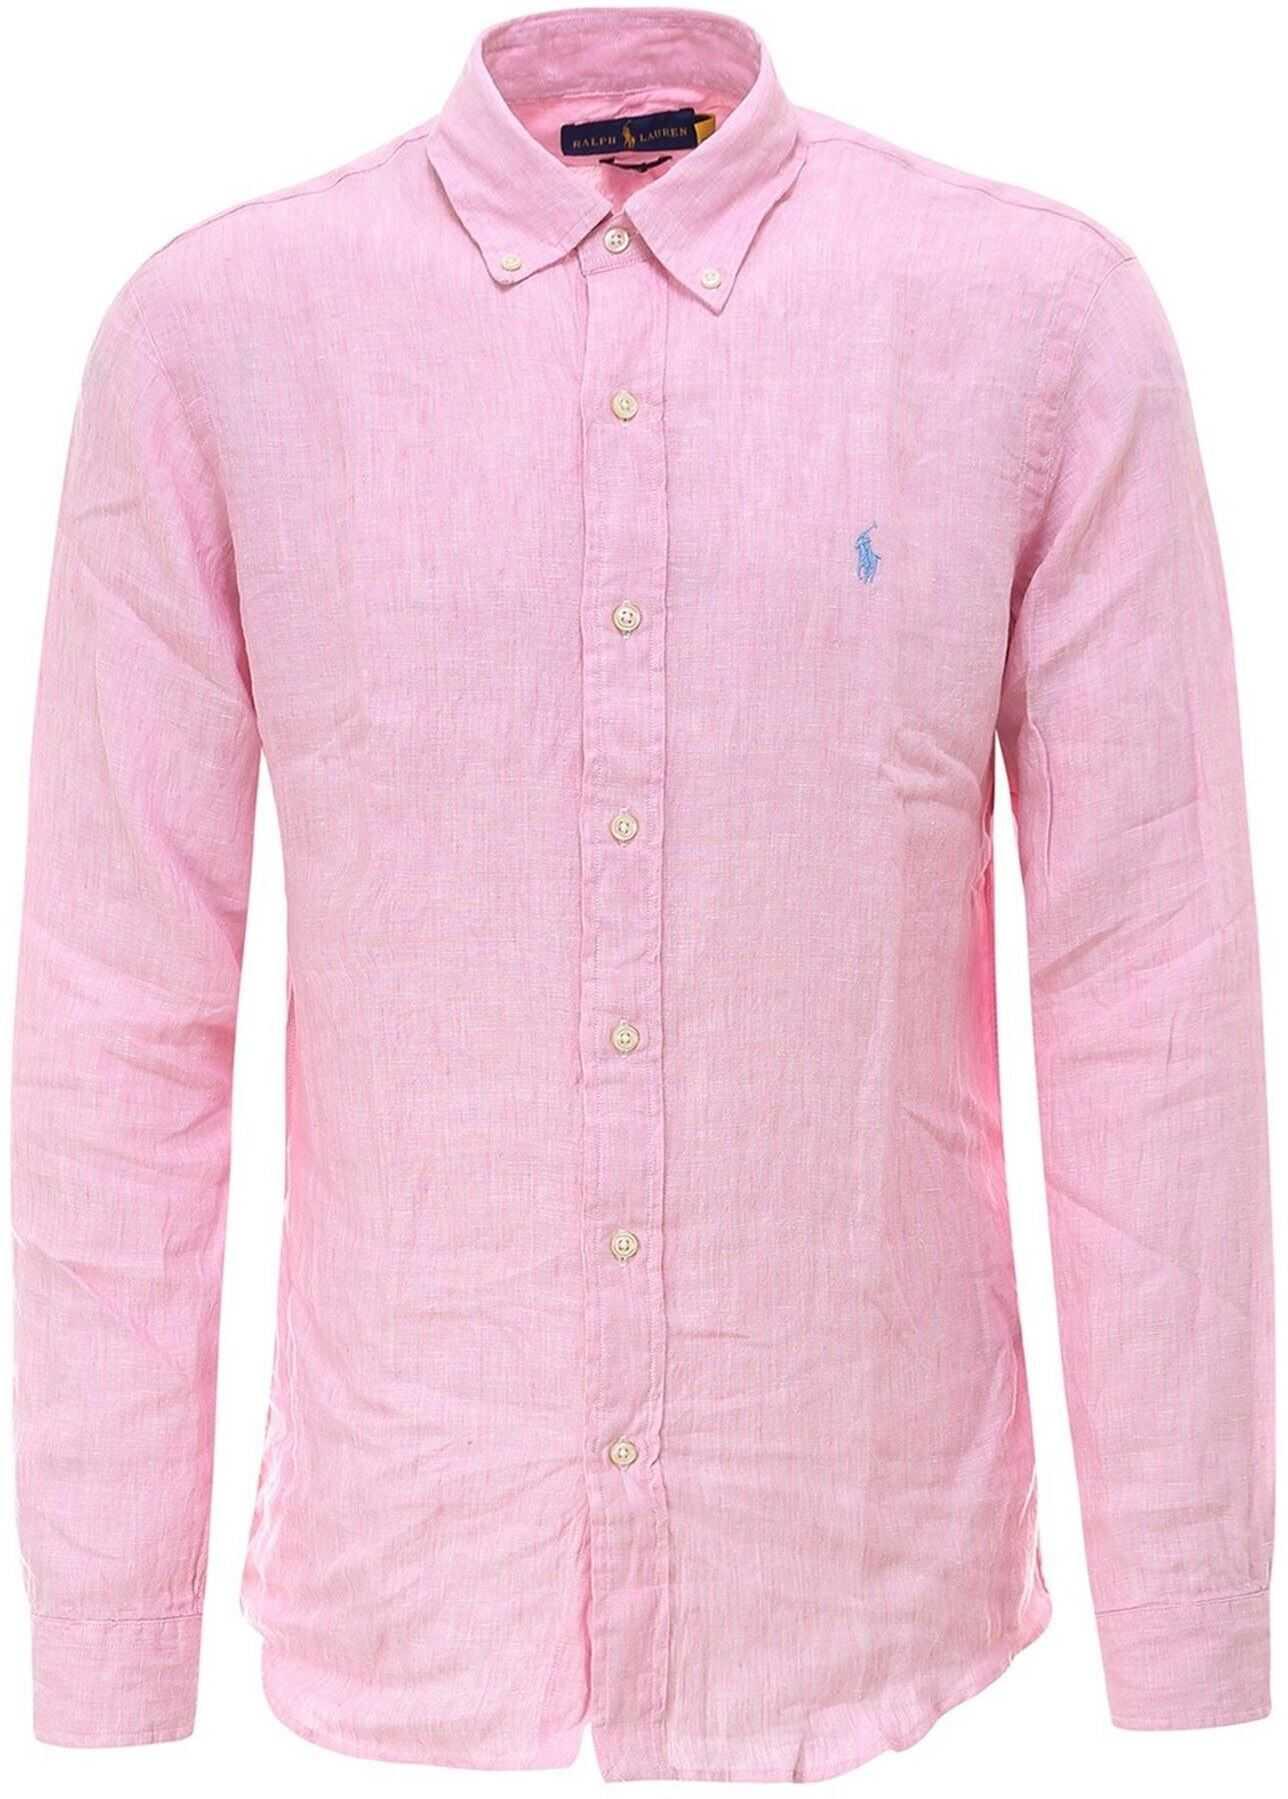 Ralph Lauren Linen Shirt In Pink Pink imagine